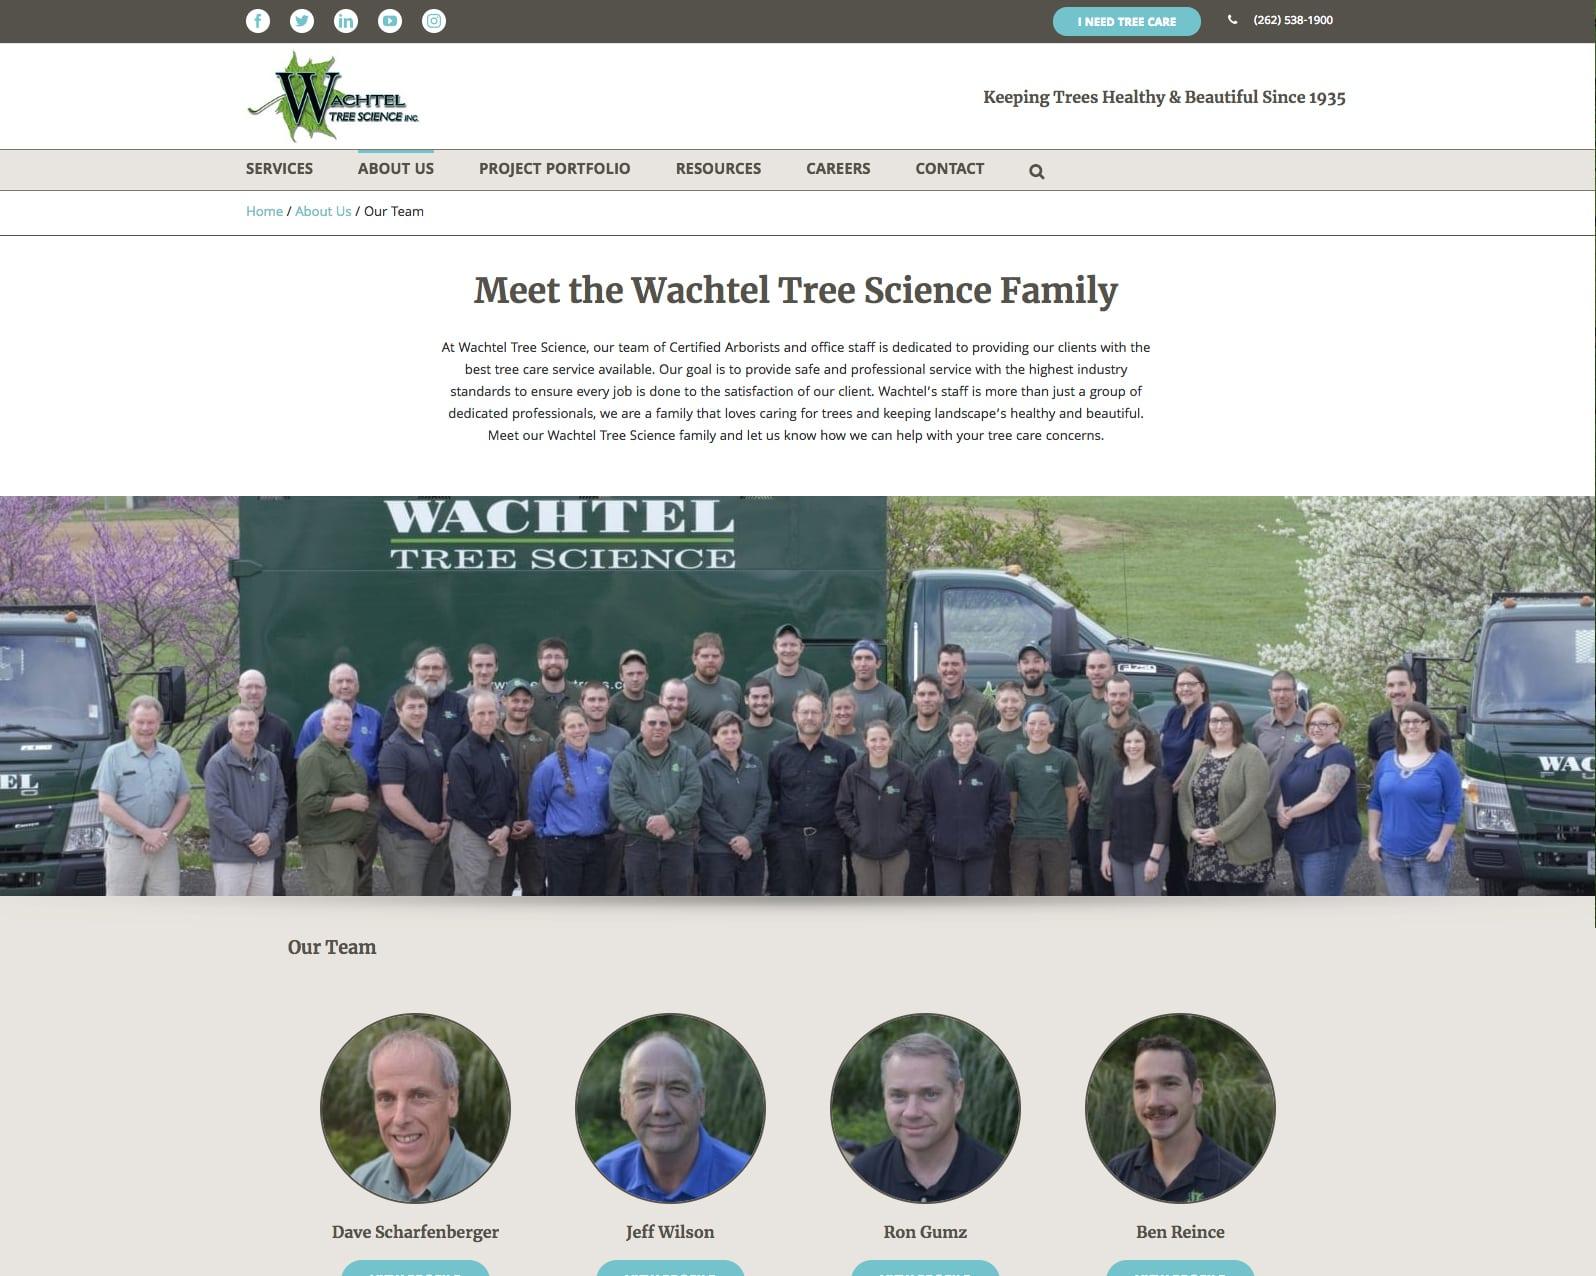 Wachtel about us webpage